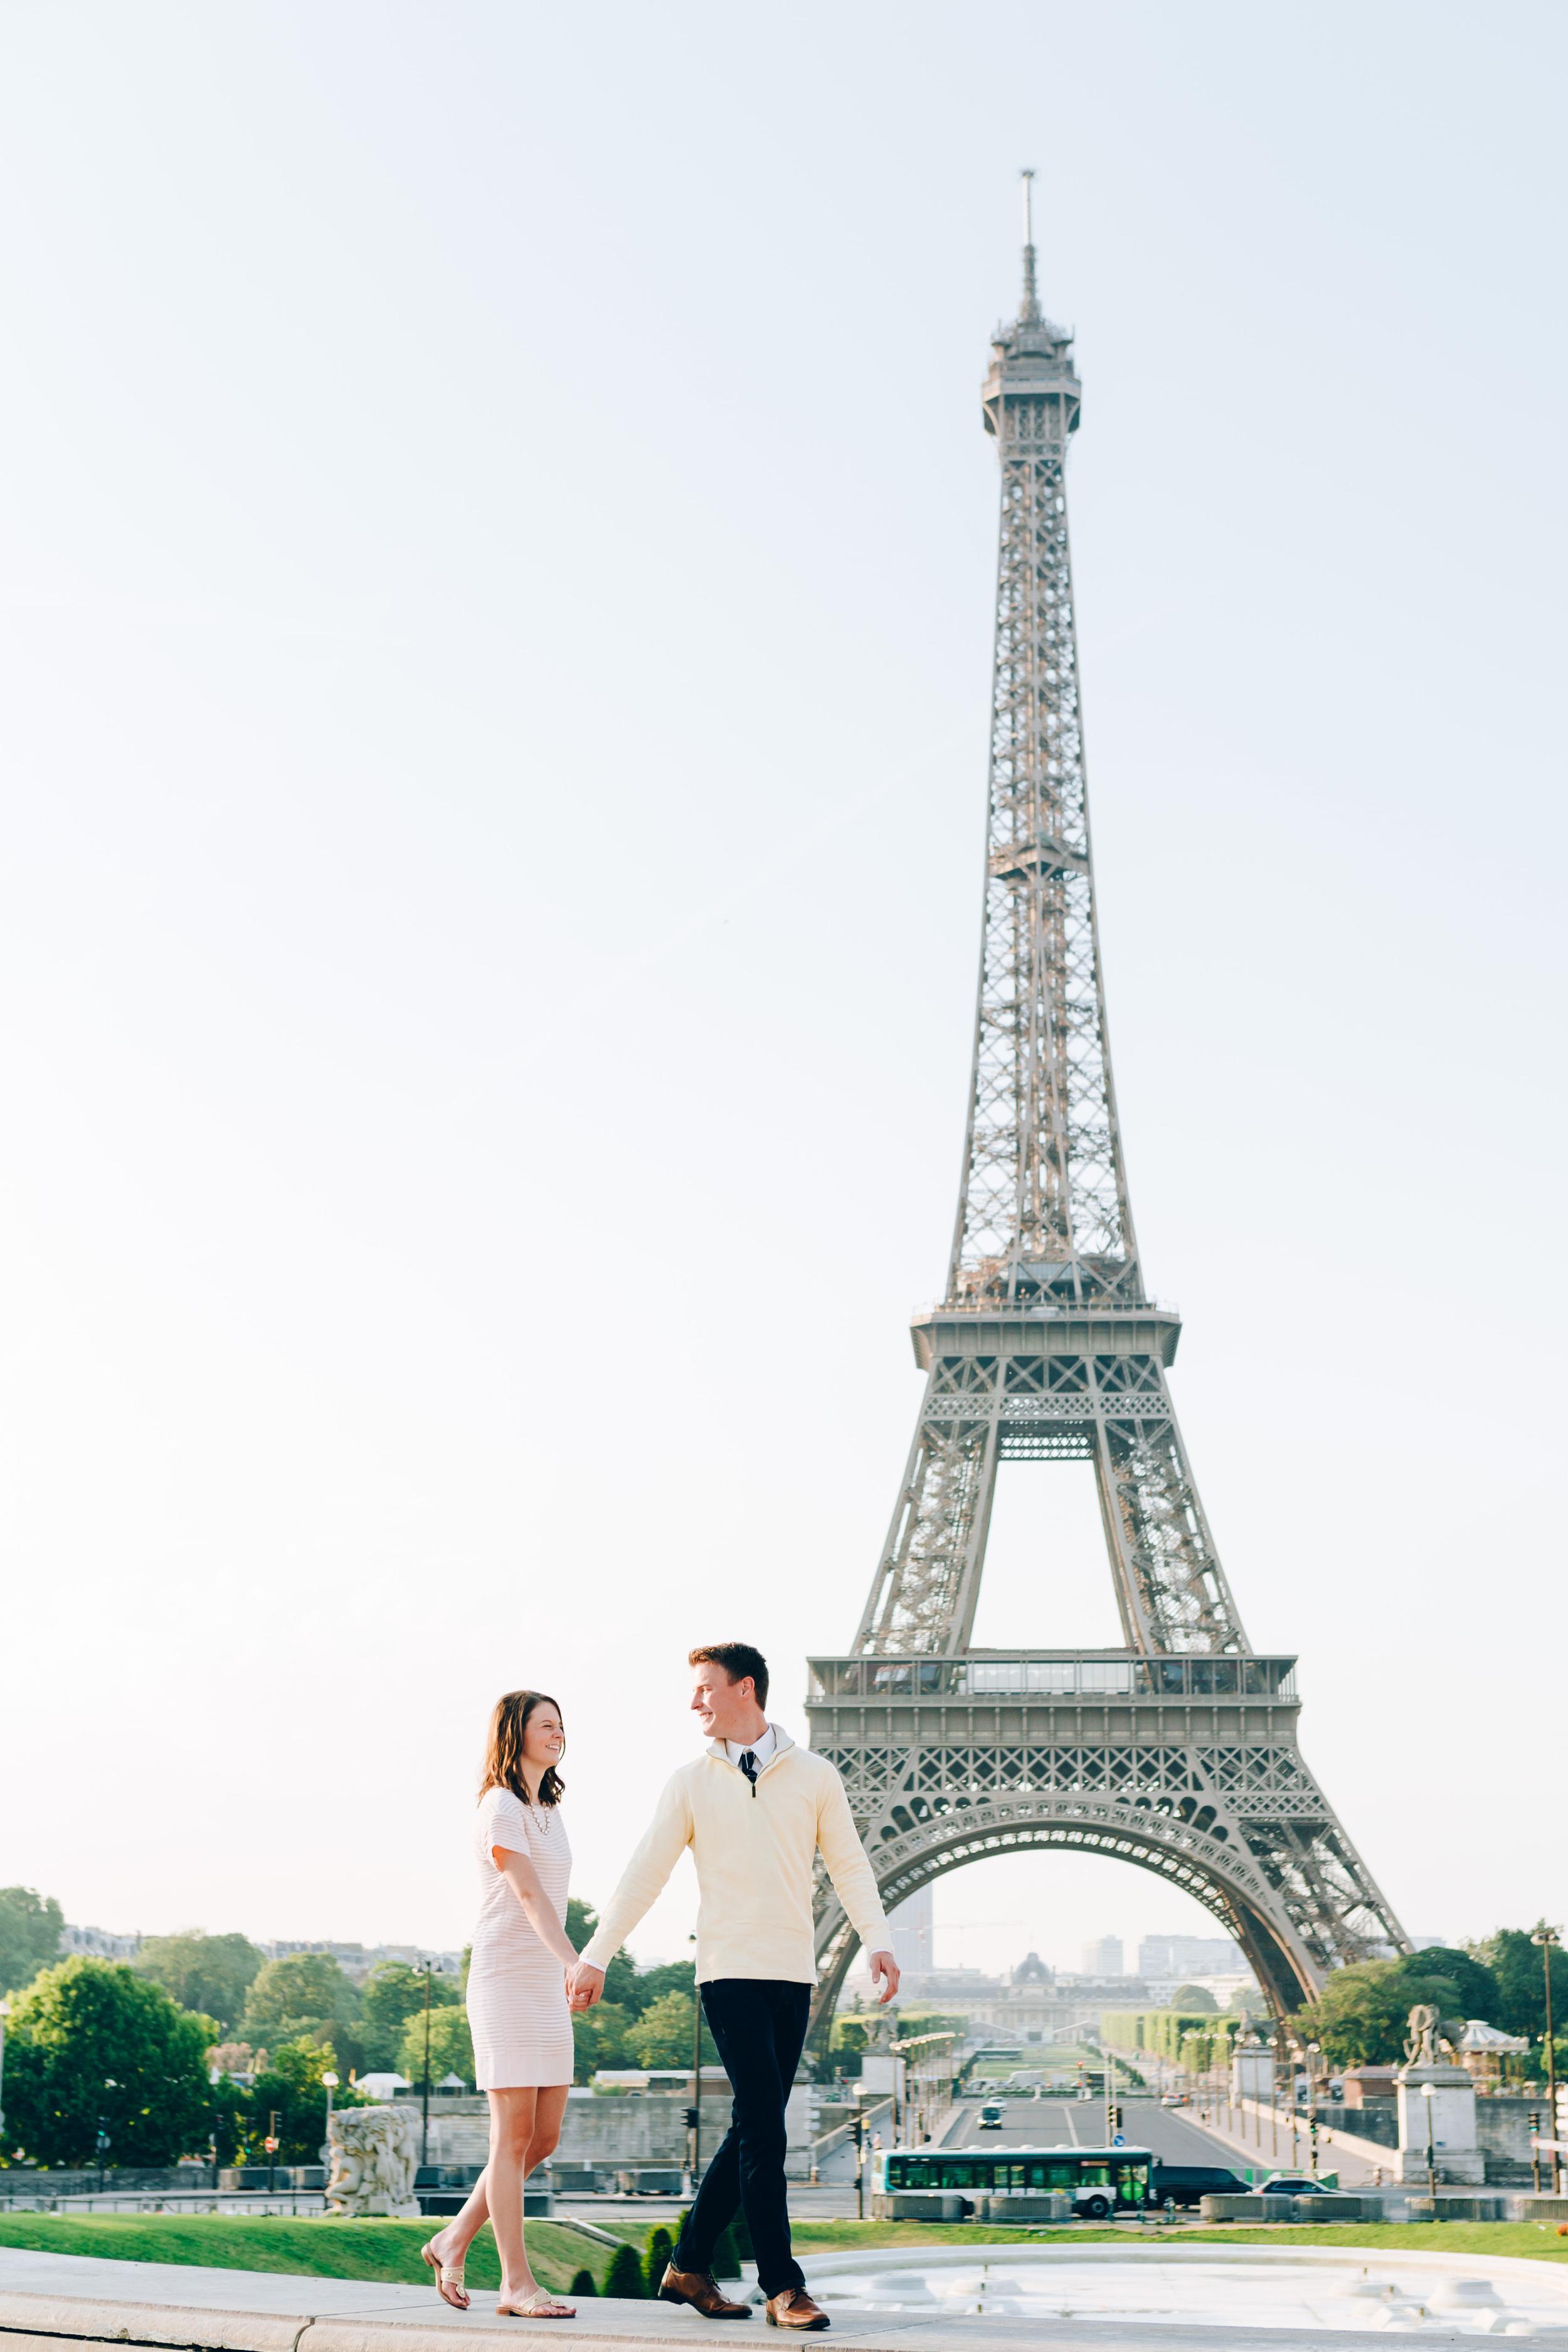 Paris-Photographer-Eiffel-Tower-Propose-in-Paris-Iheartparisfr.jpg